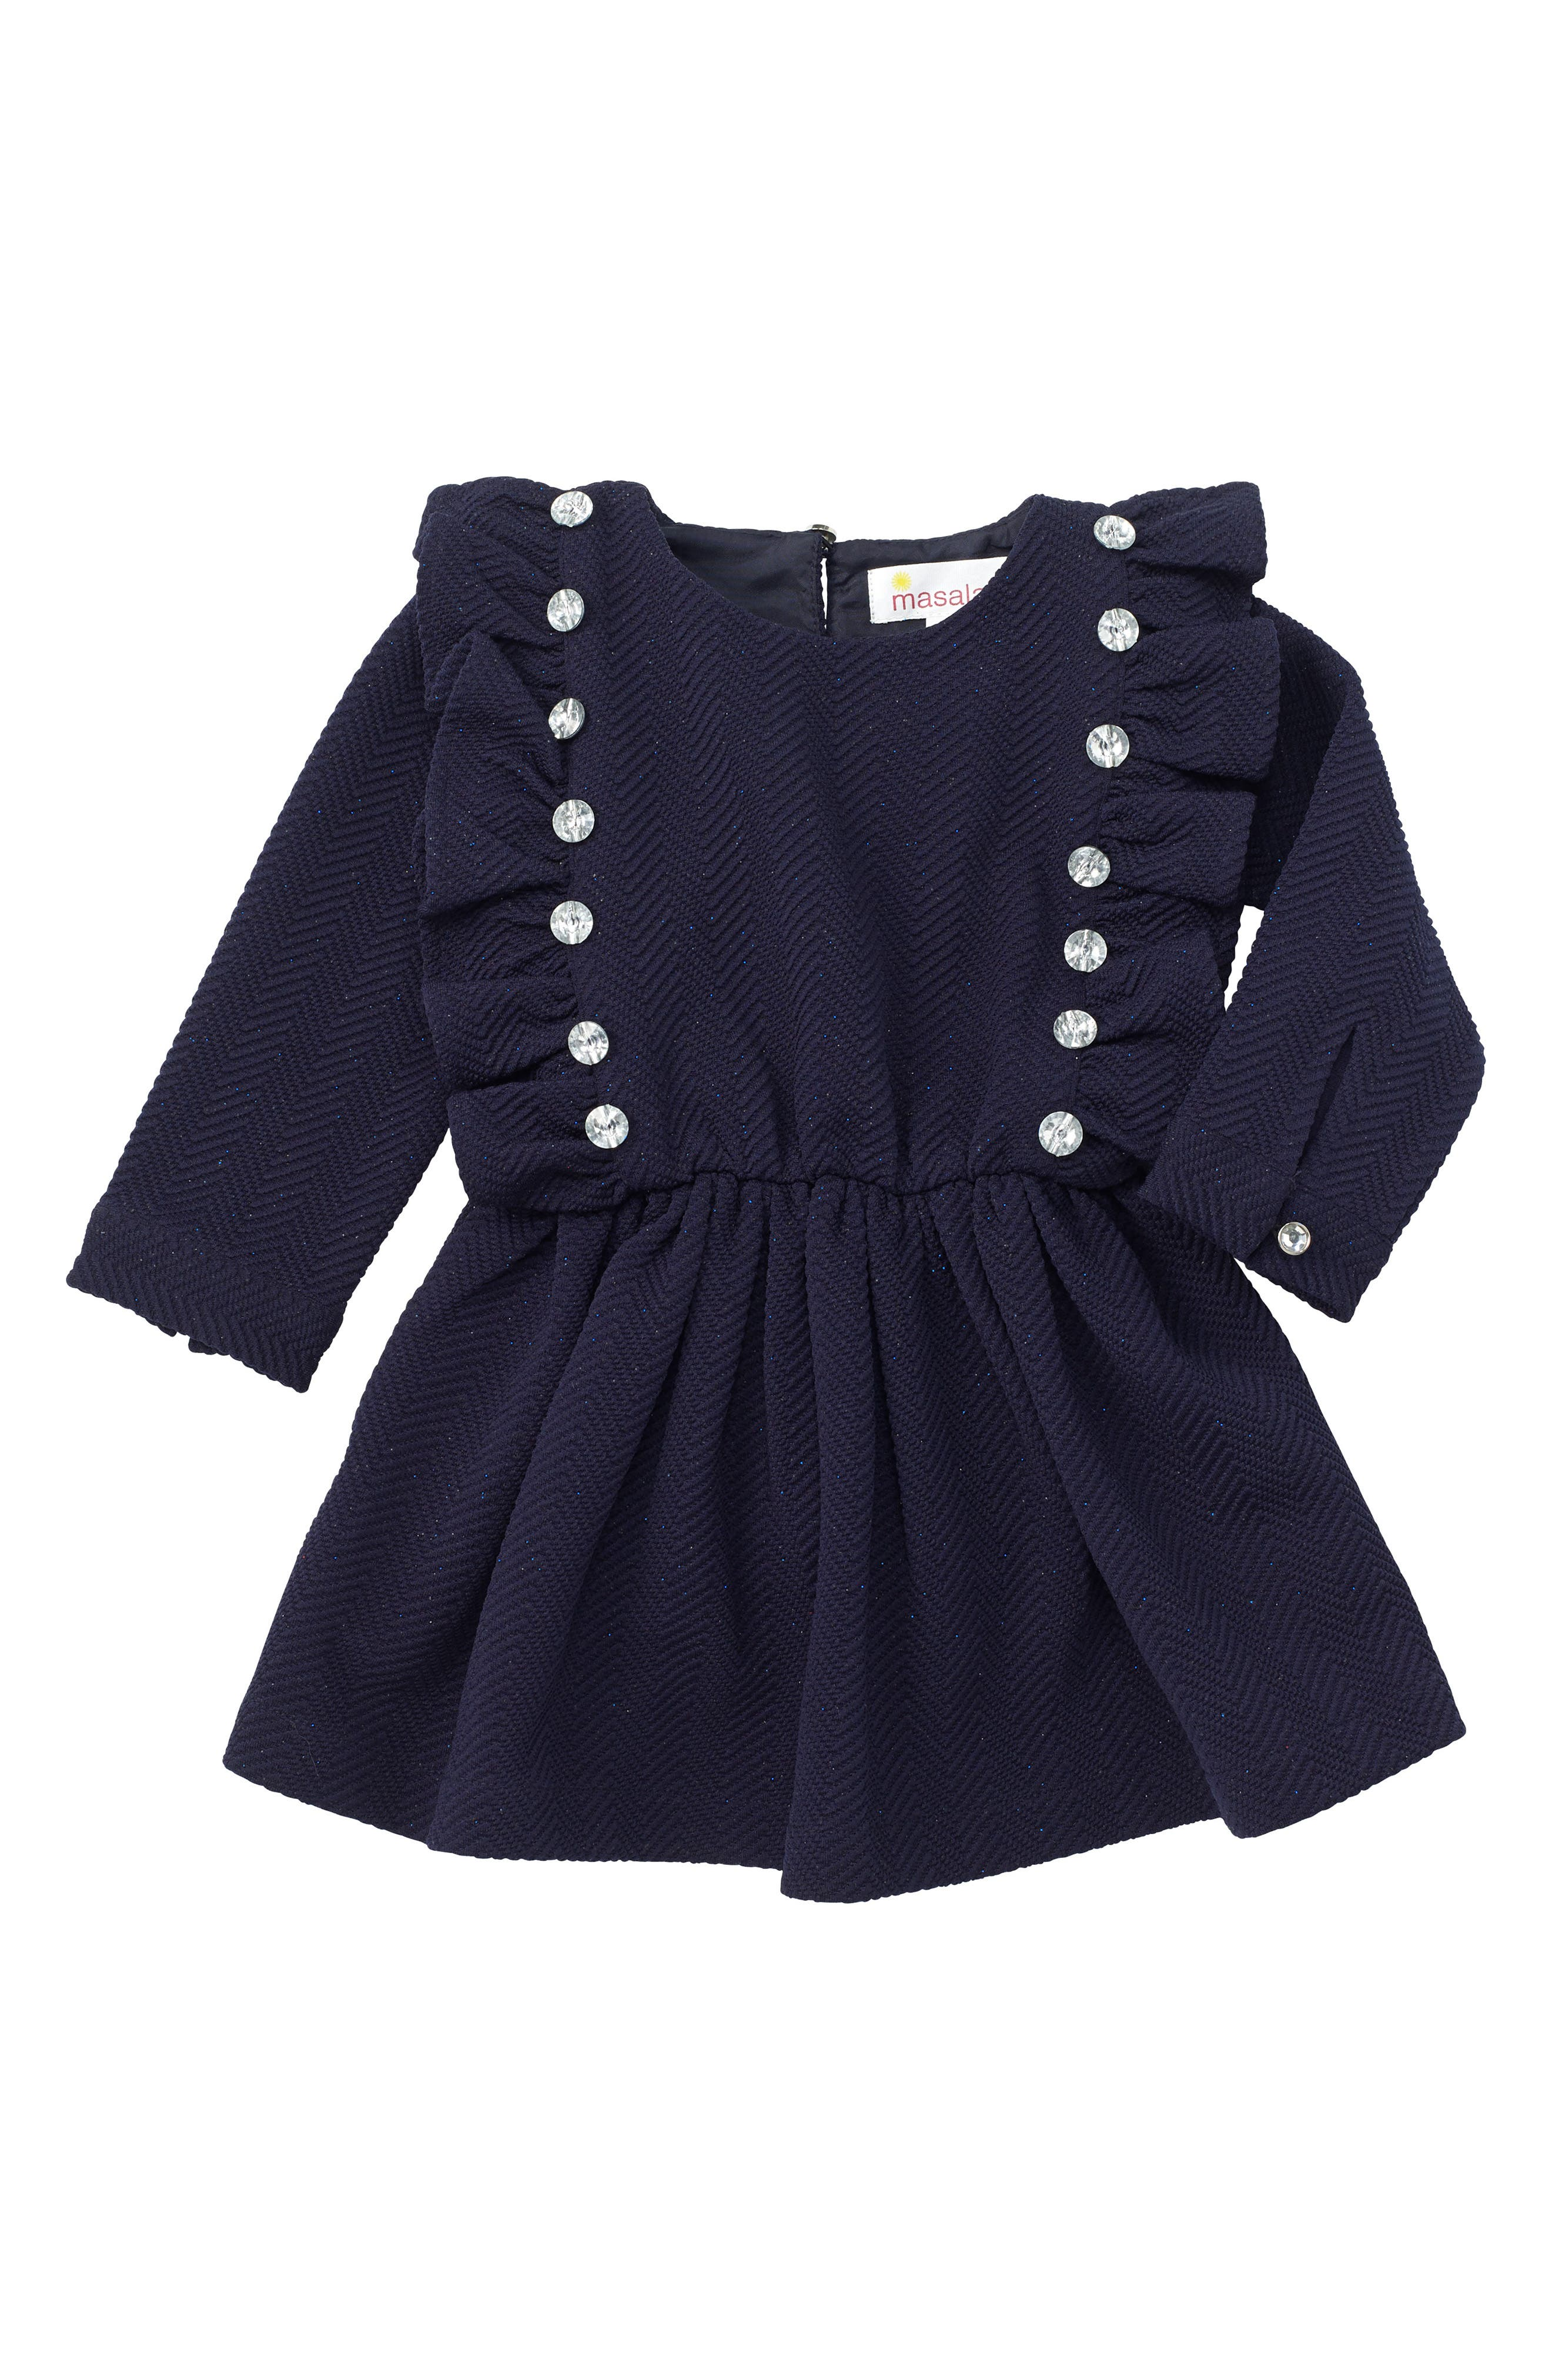 Fantasia Dress,                             Alternate thumbnail 3, color,